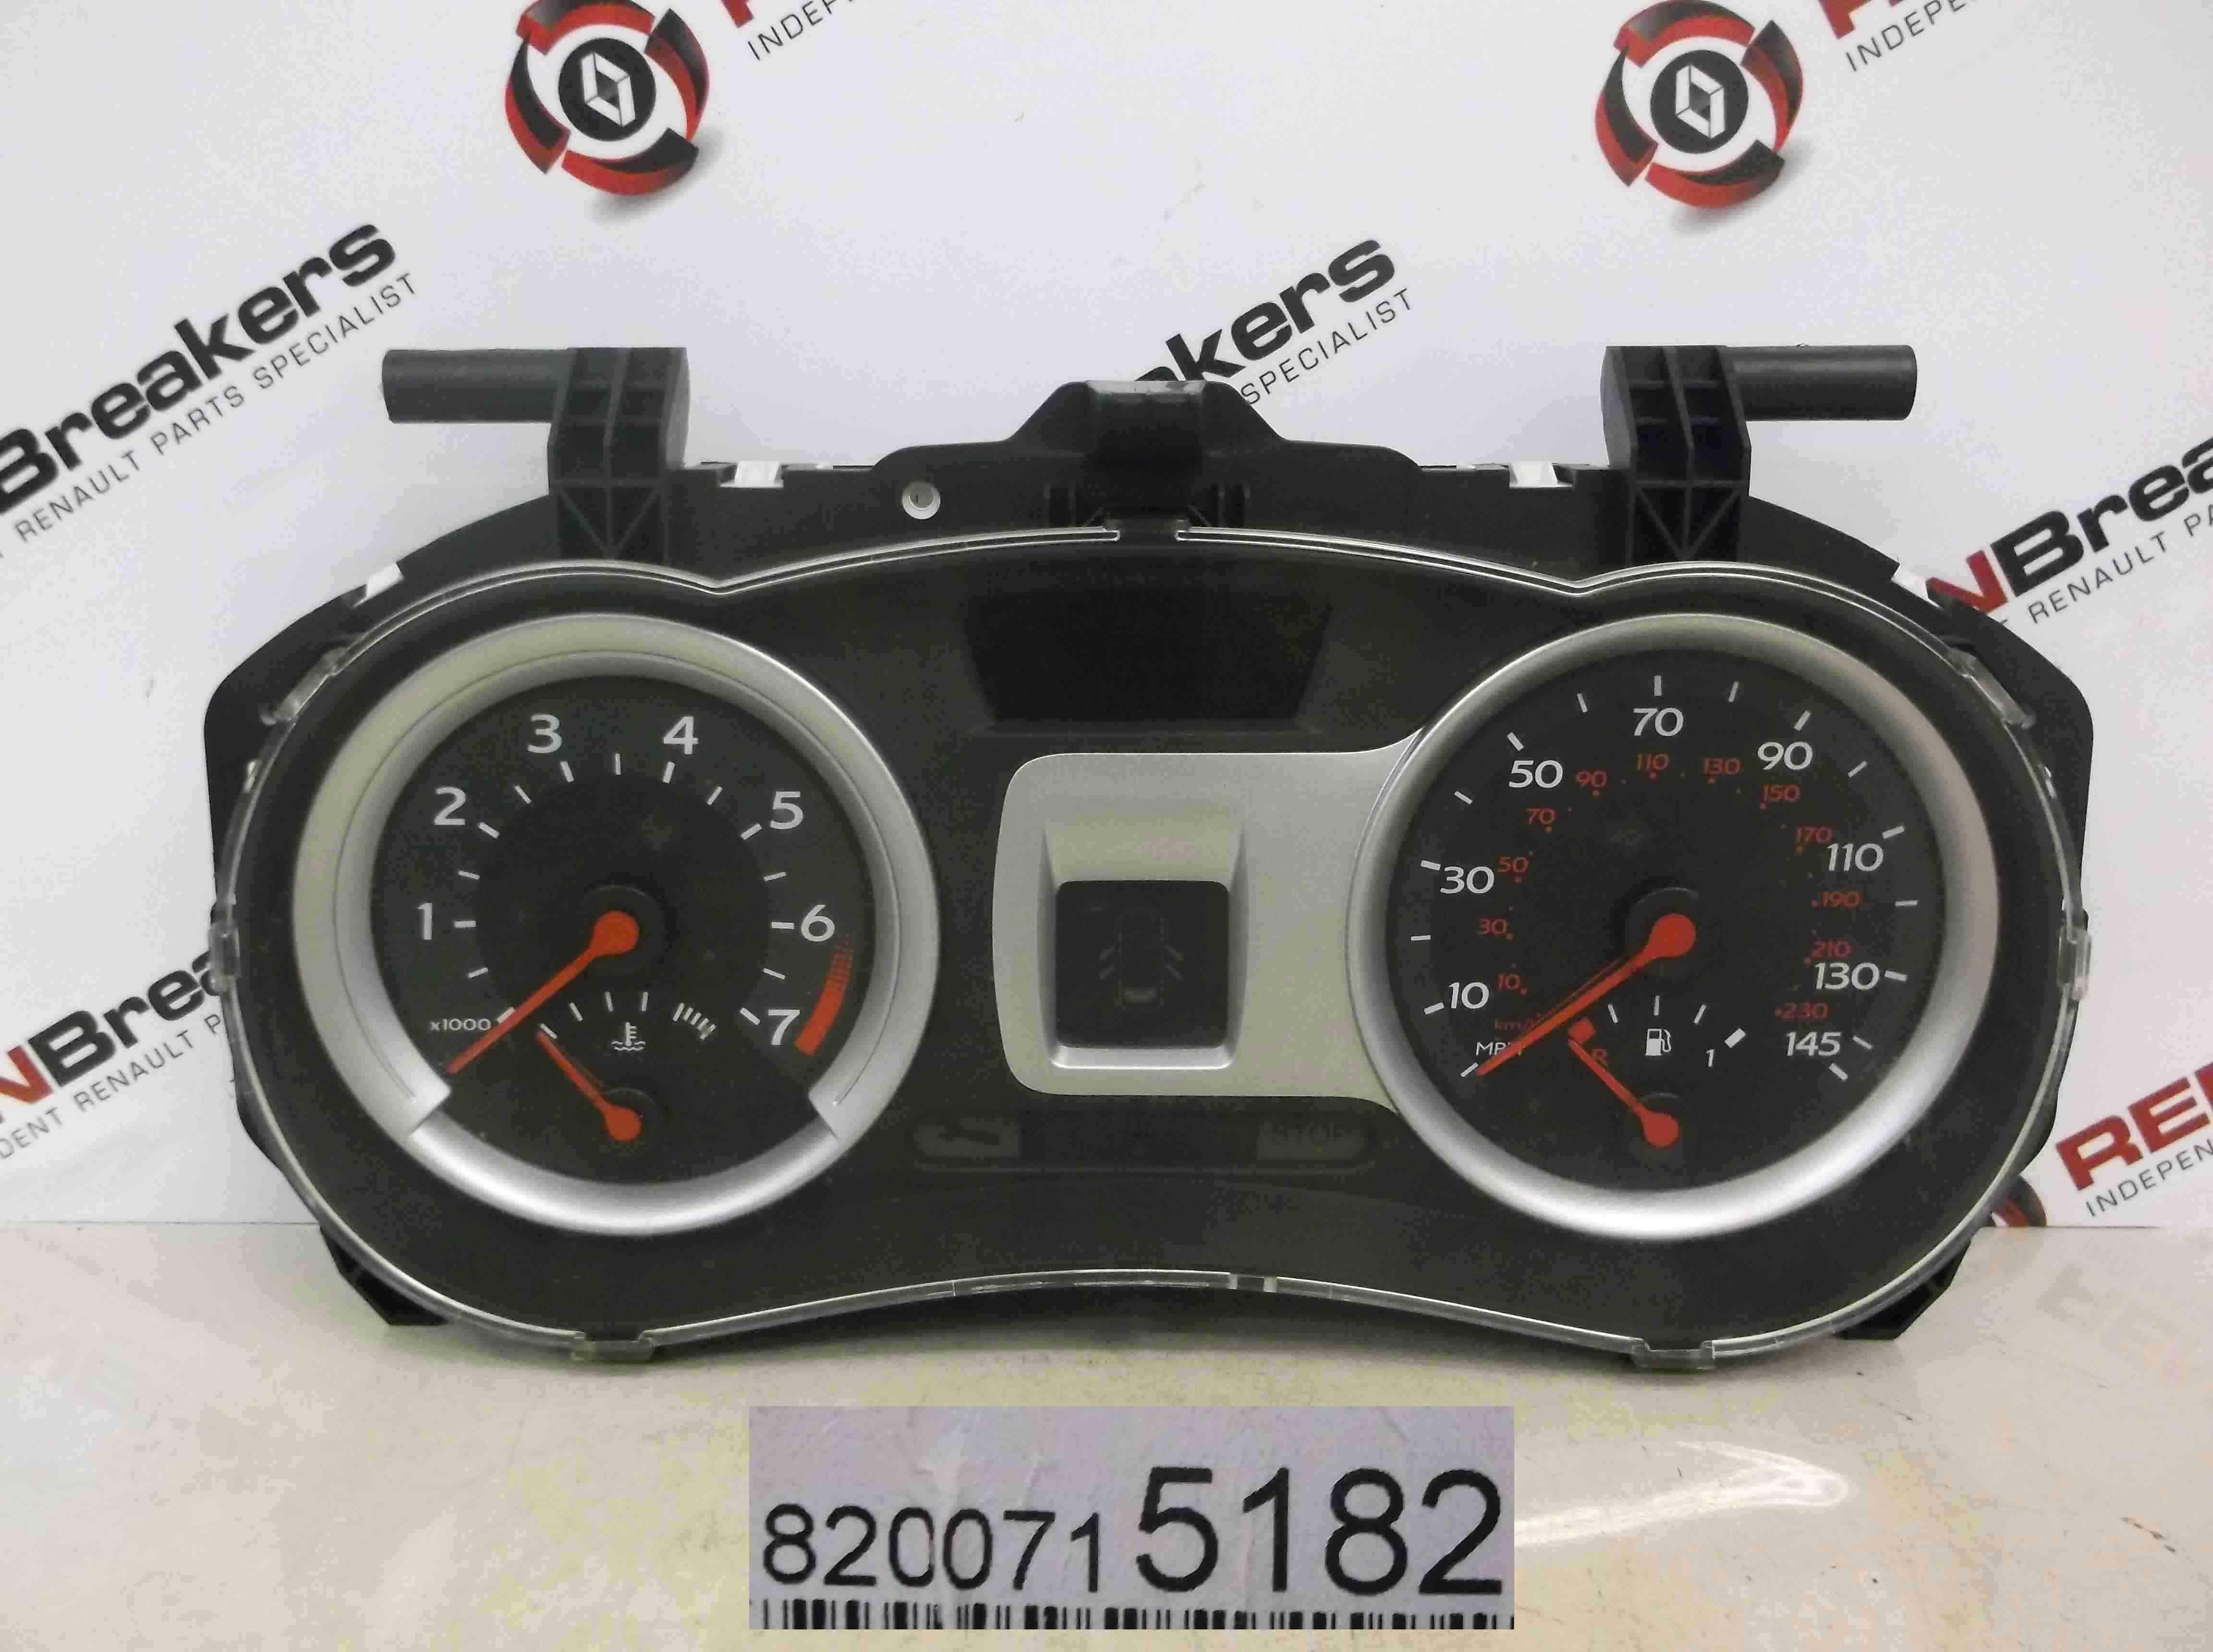 Renault Clio MK3 2005-2012 Instrument Dials Clocks Gauges 135k 8200715182